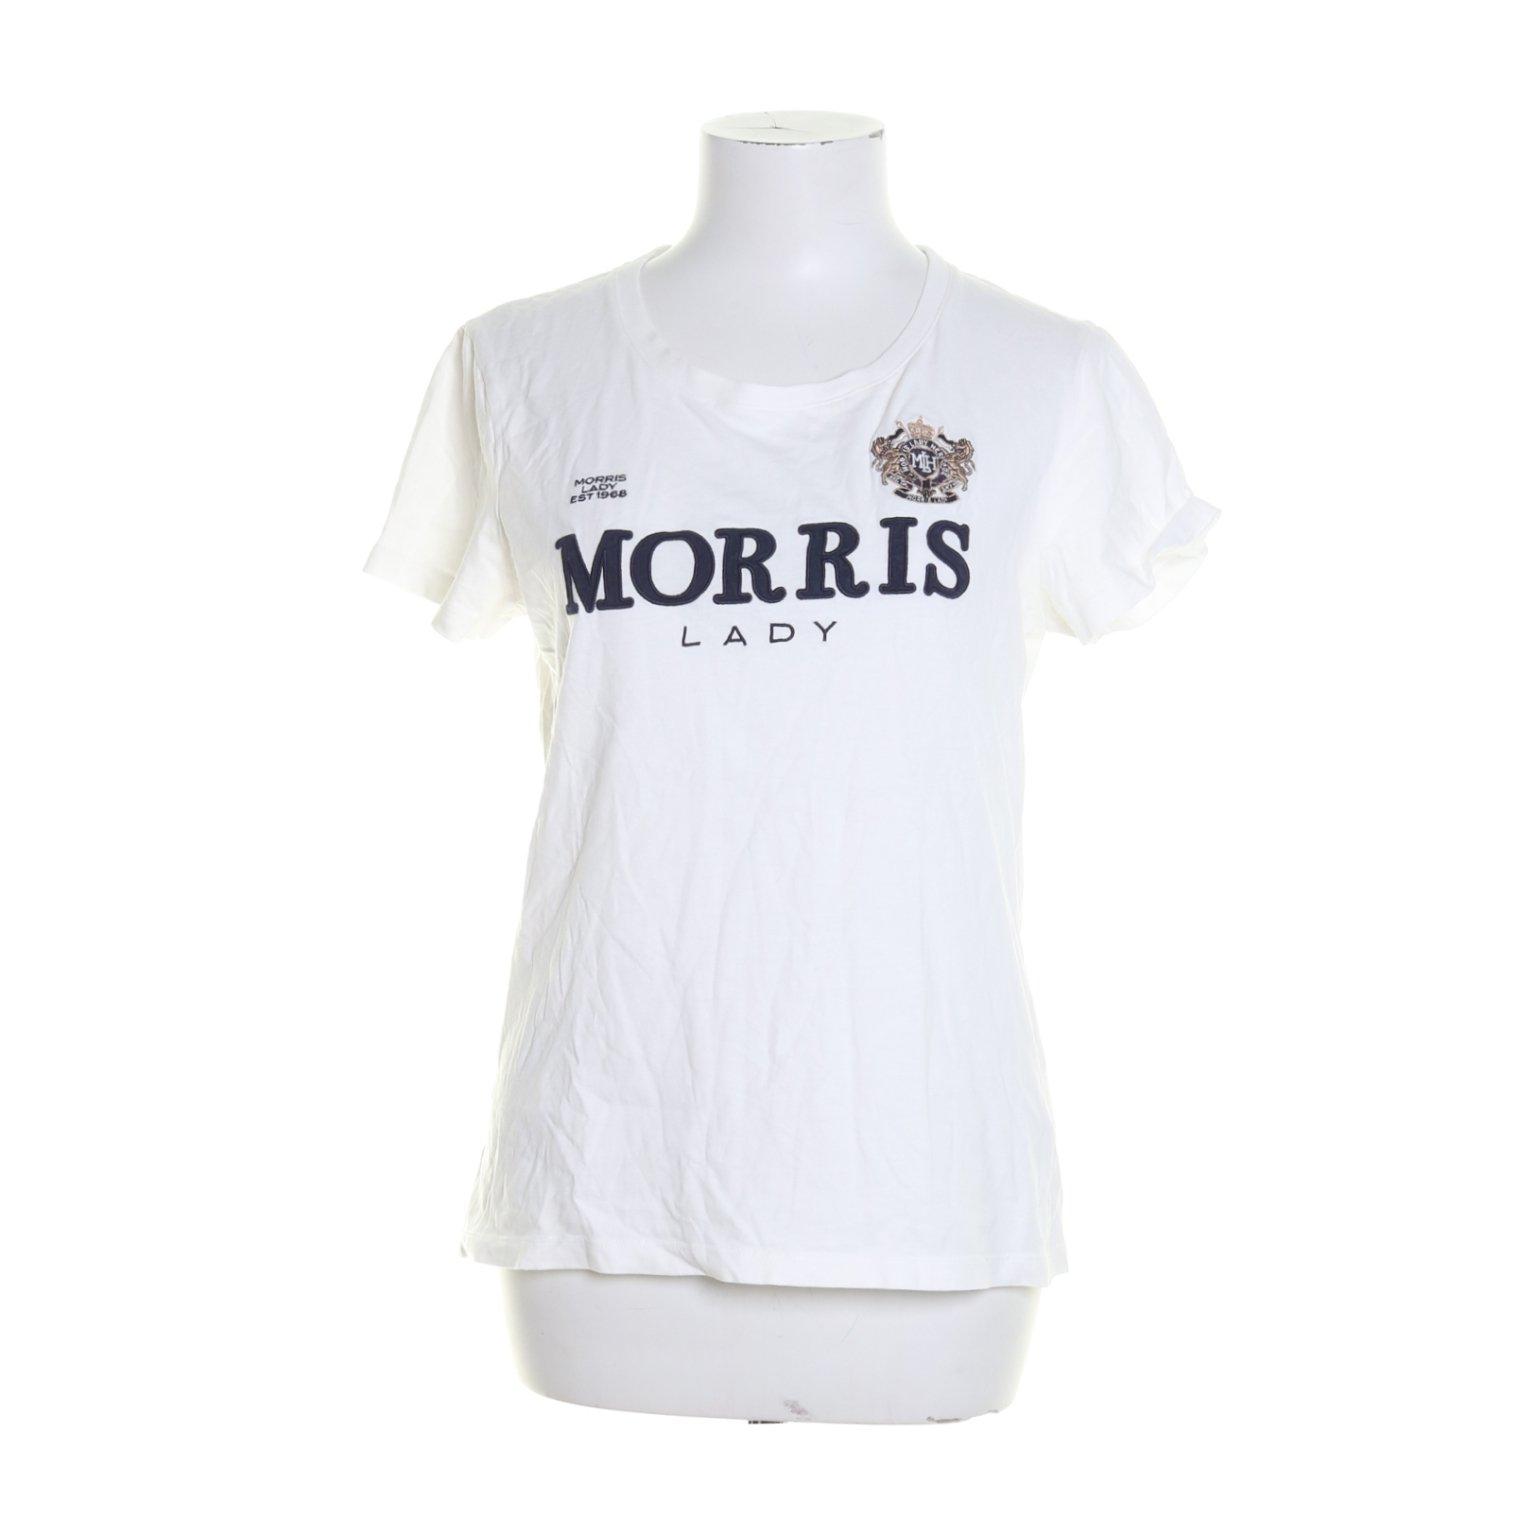 morris lady t shirt